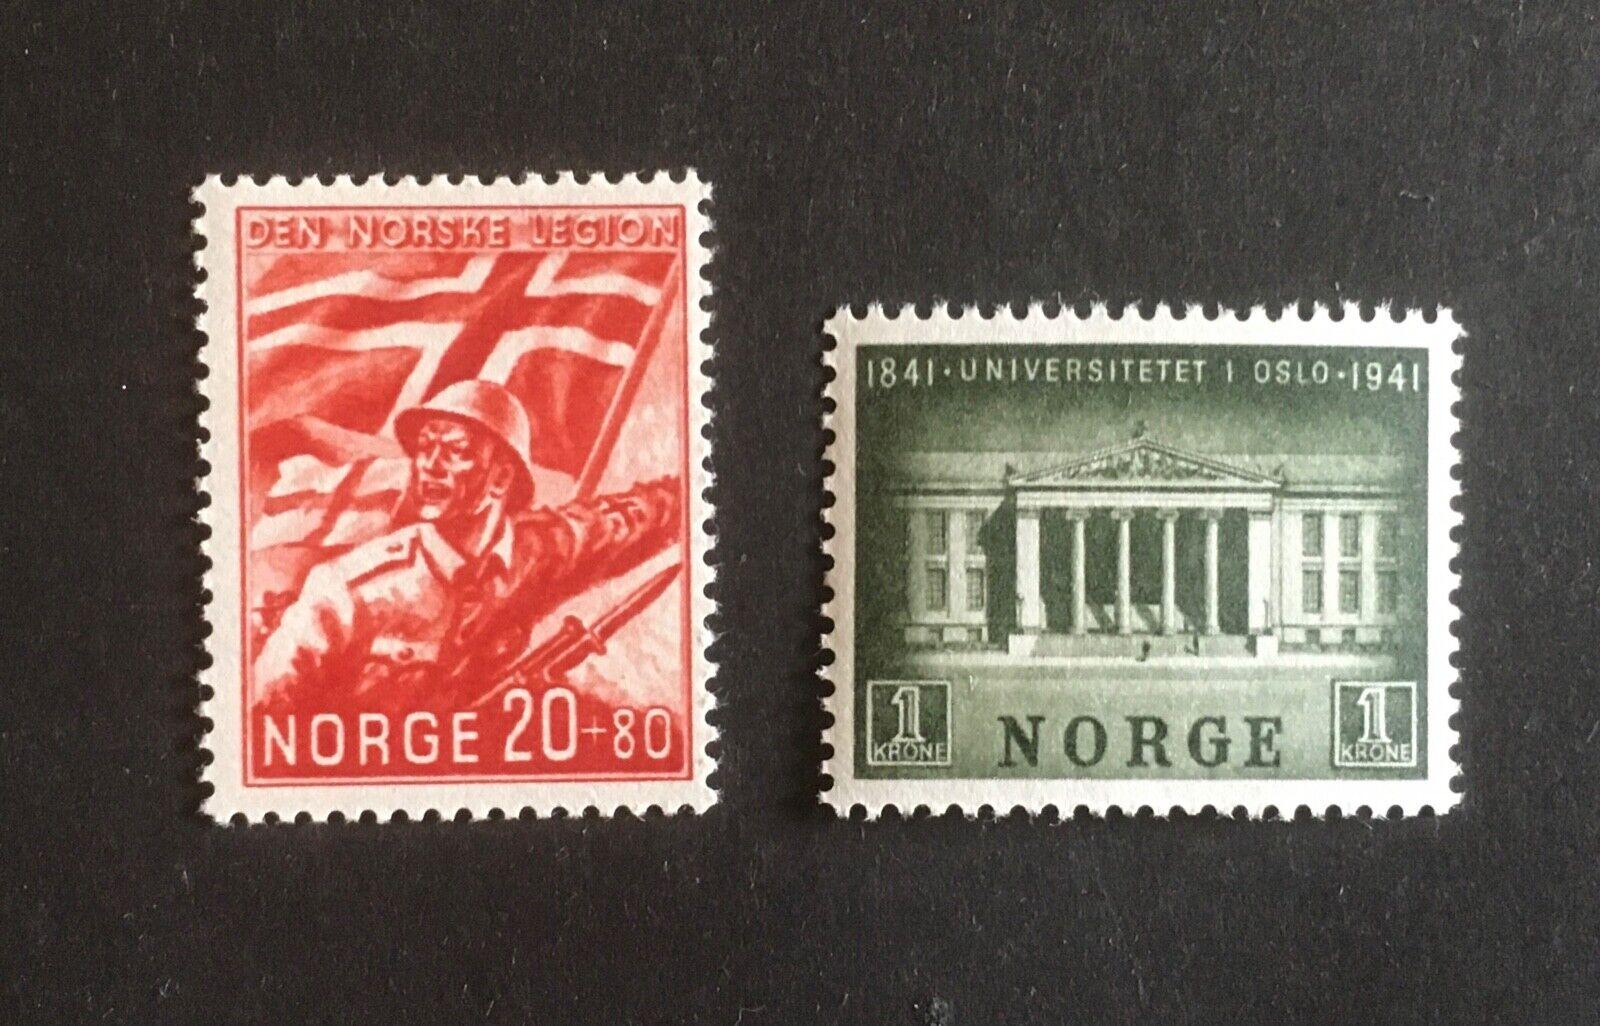 Michel Nr 236 + 258 Norwegen 1941 Postfrisch MNH